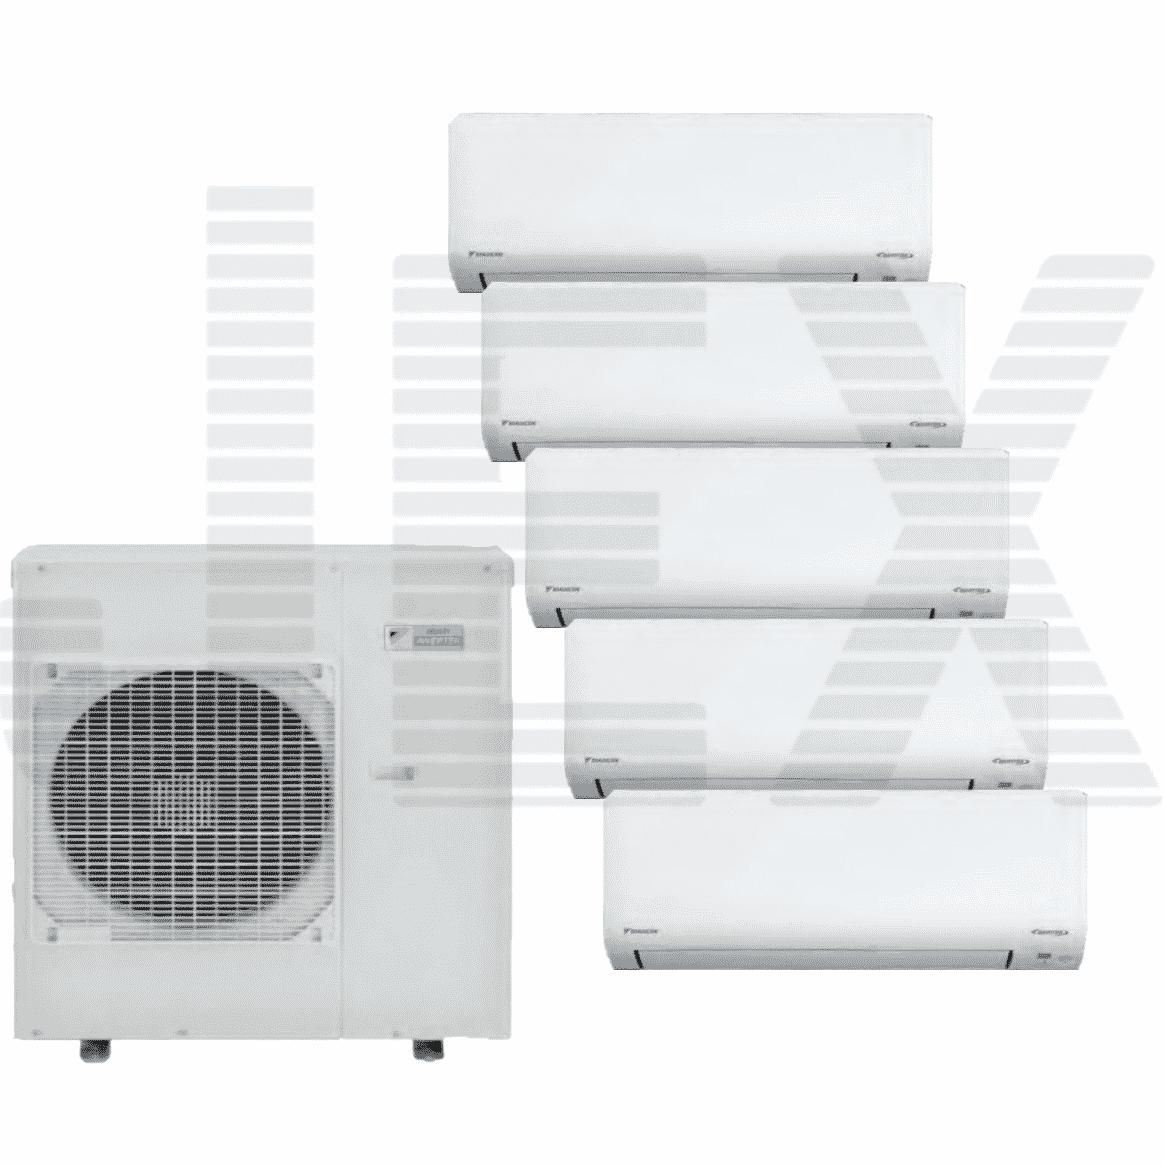 Daikin iSmileECO System 5 (5 Ticks)